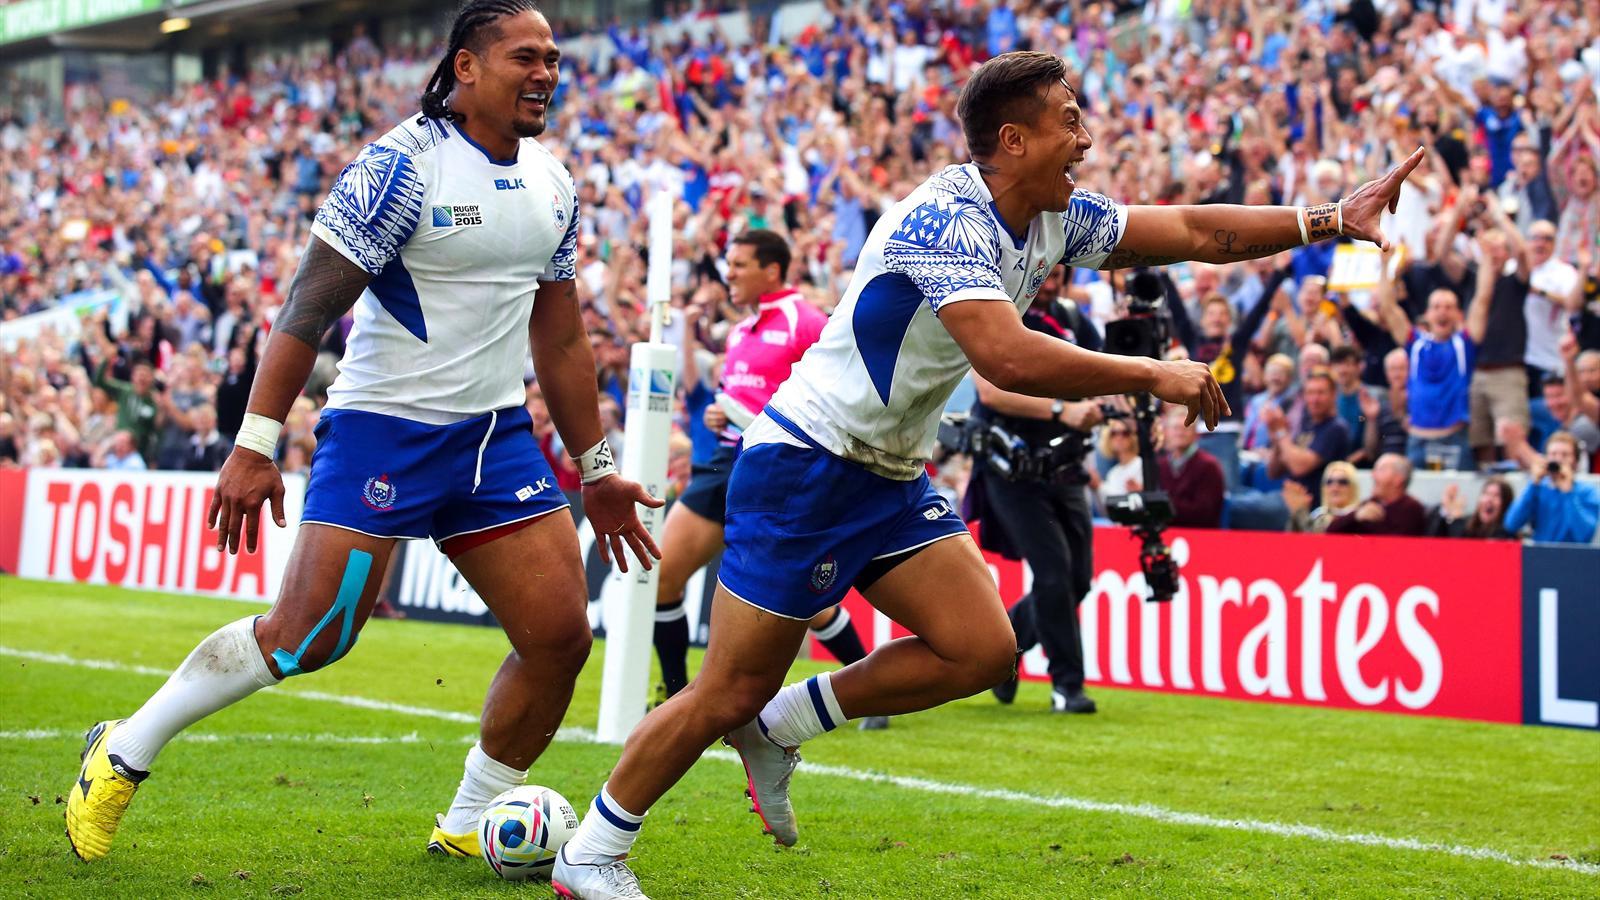 Tim Nanai Williams (Samoa) face aux Etats-Unis - le 20 septembre 2015